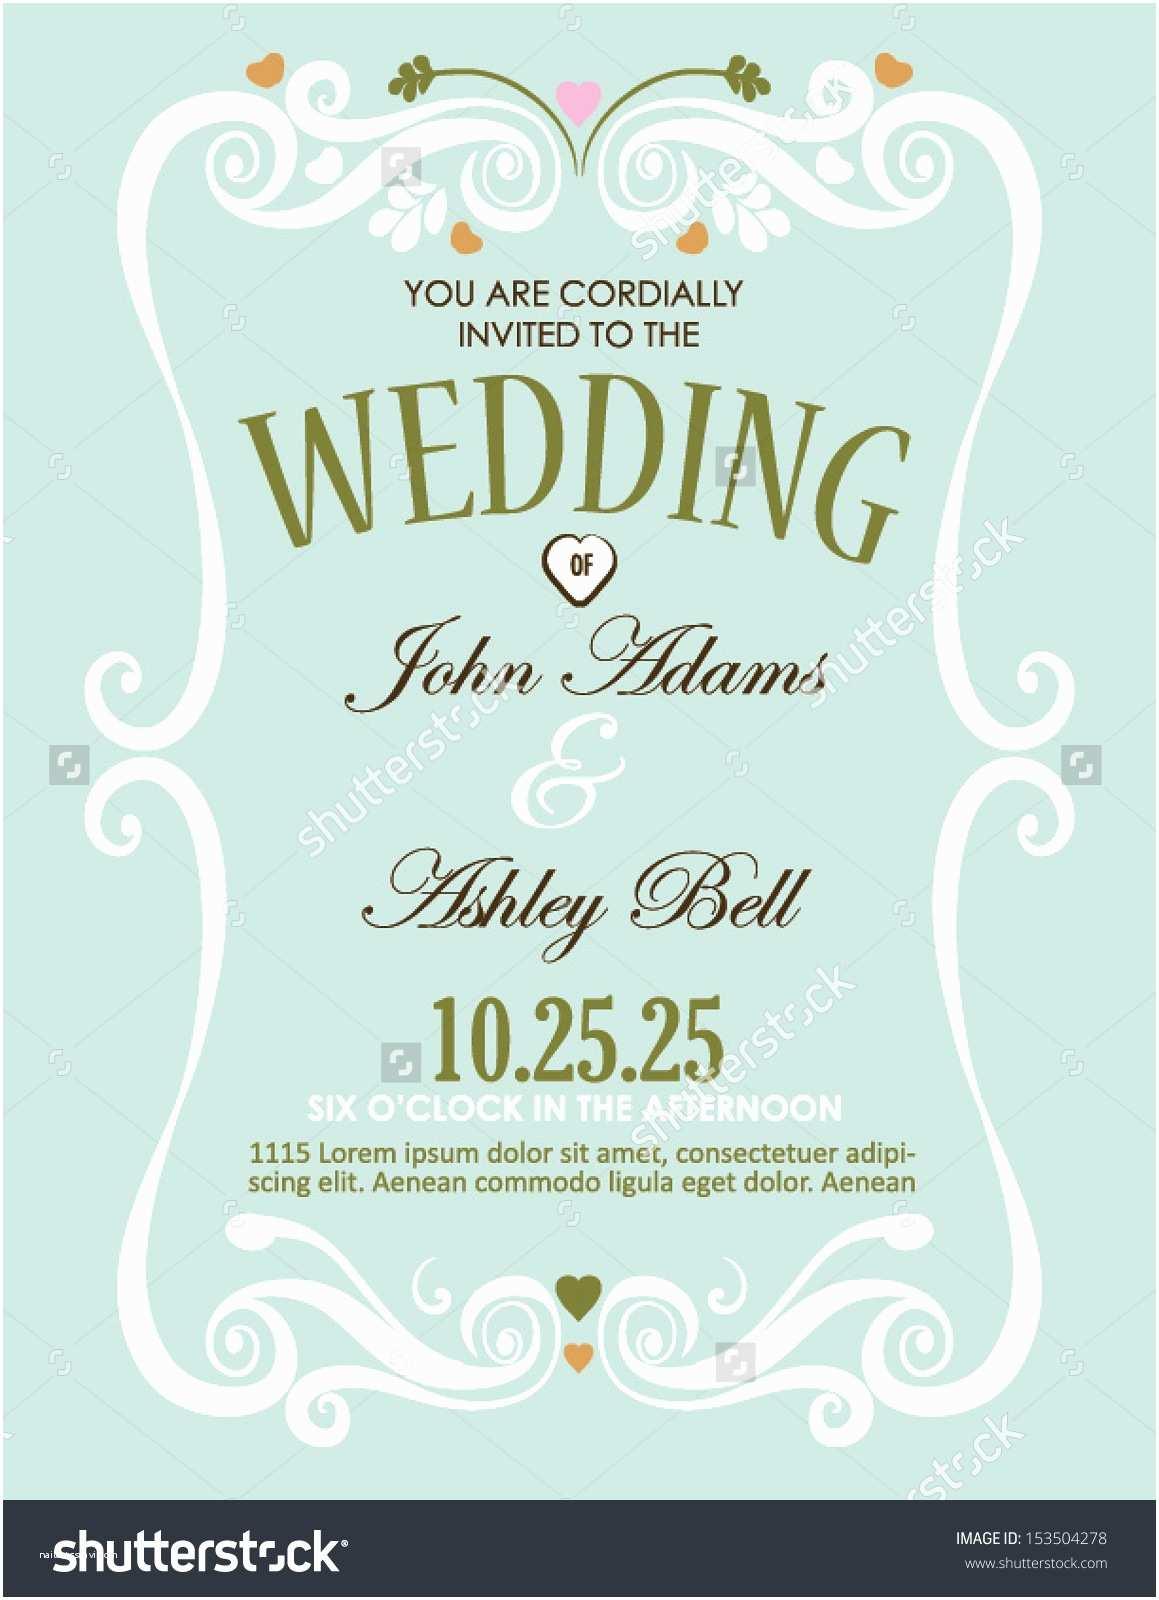 Wedding Invitation Designs Free Wedding Invitation Card